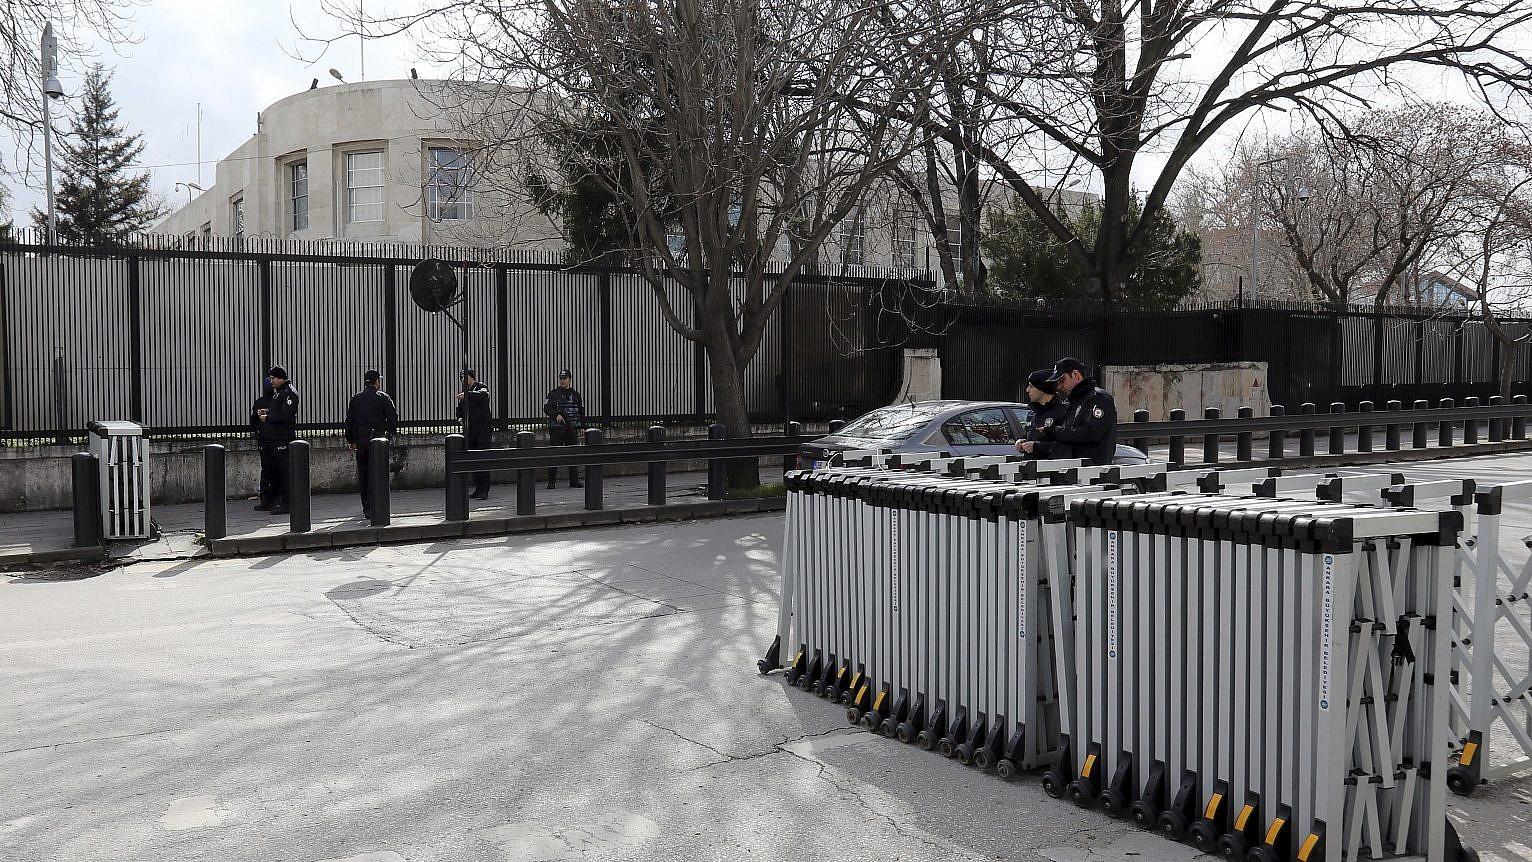 Turkey said to detain 4 Iraqis plotting US embassy attack | The ...